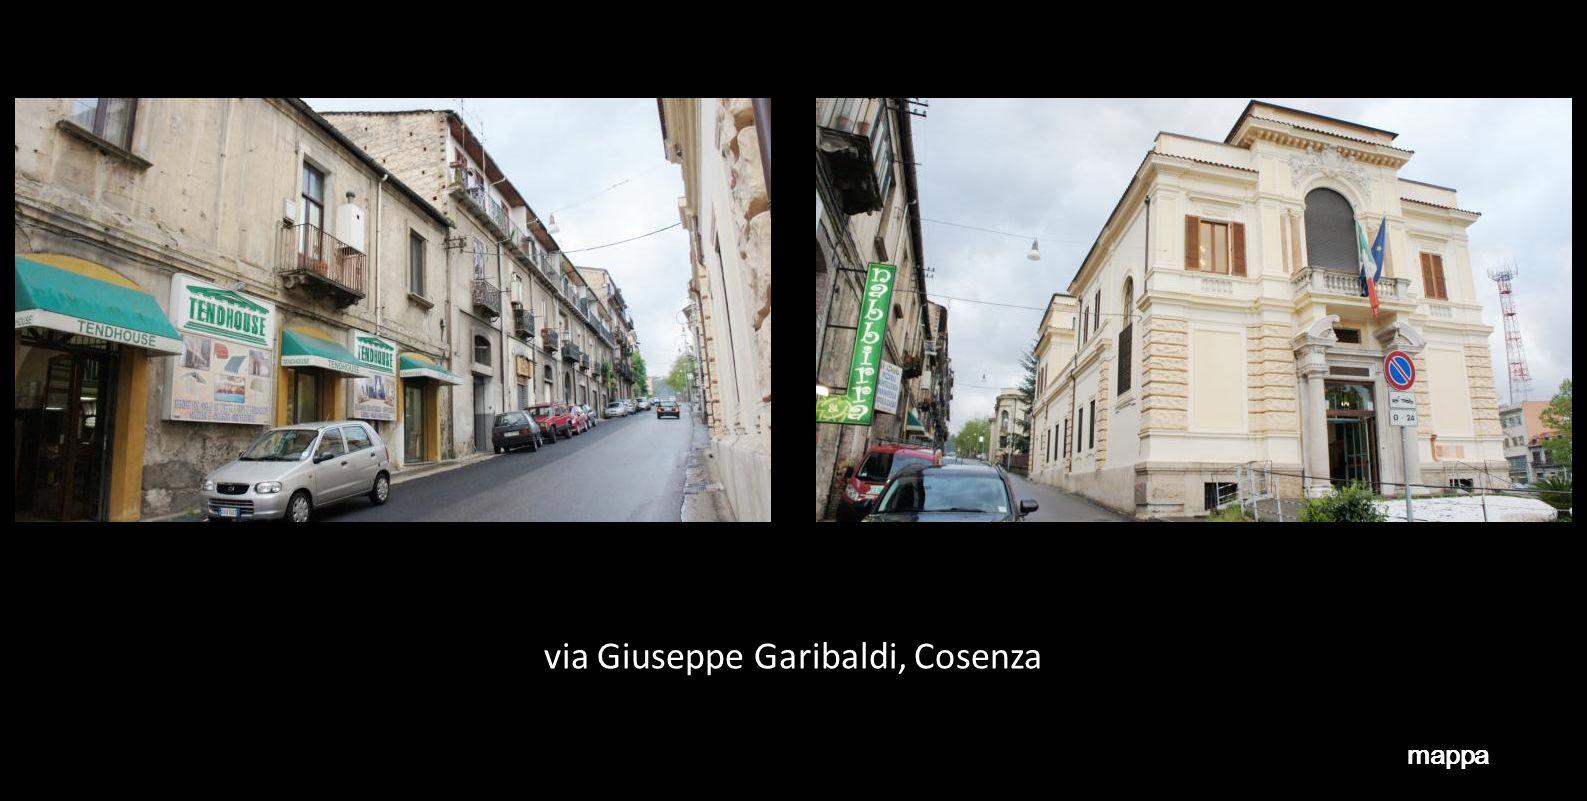 via Giuseppe Garibaldi, Cosenza mappa